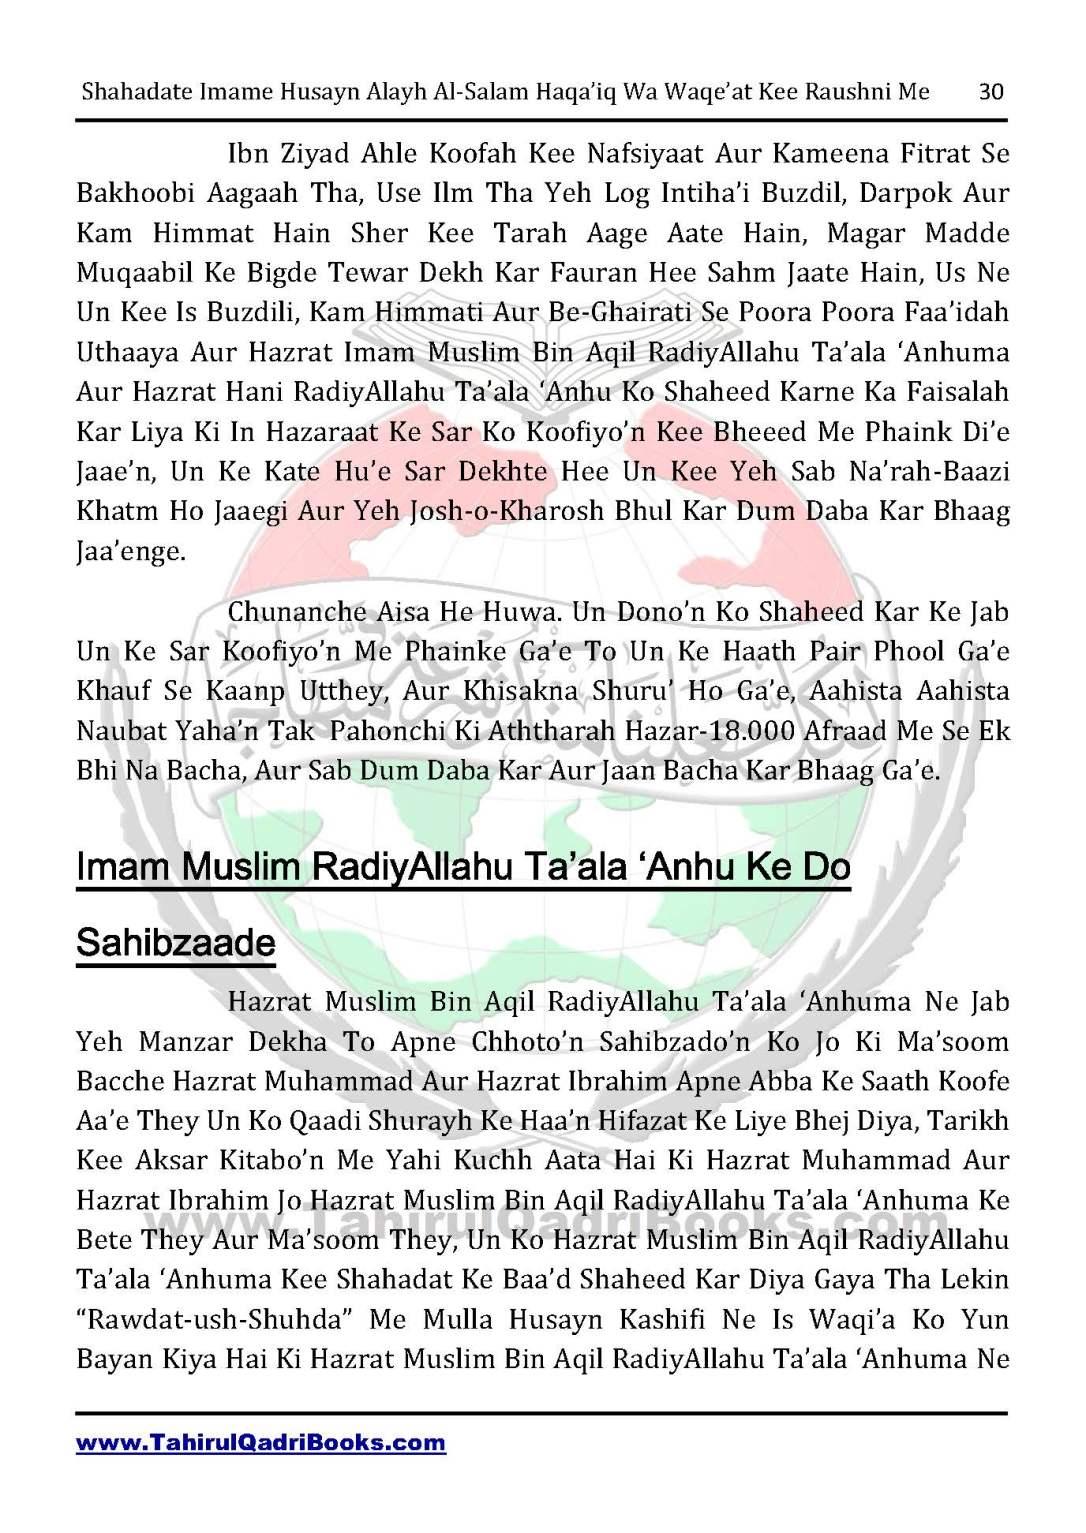 shahadate-imame-husayn-alayh-is-salam-haqaiq-wa-waqe_at-kee-raushni-me-in-roman-urdu-unlocked_Page_30